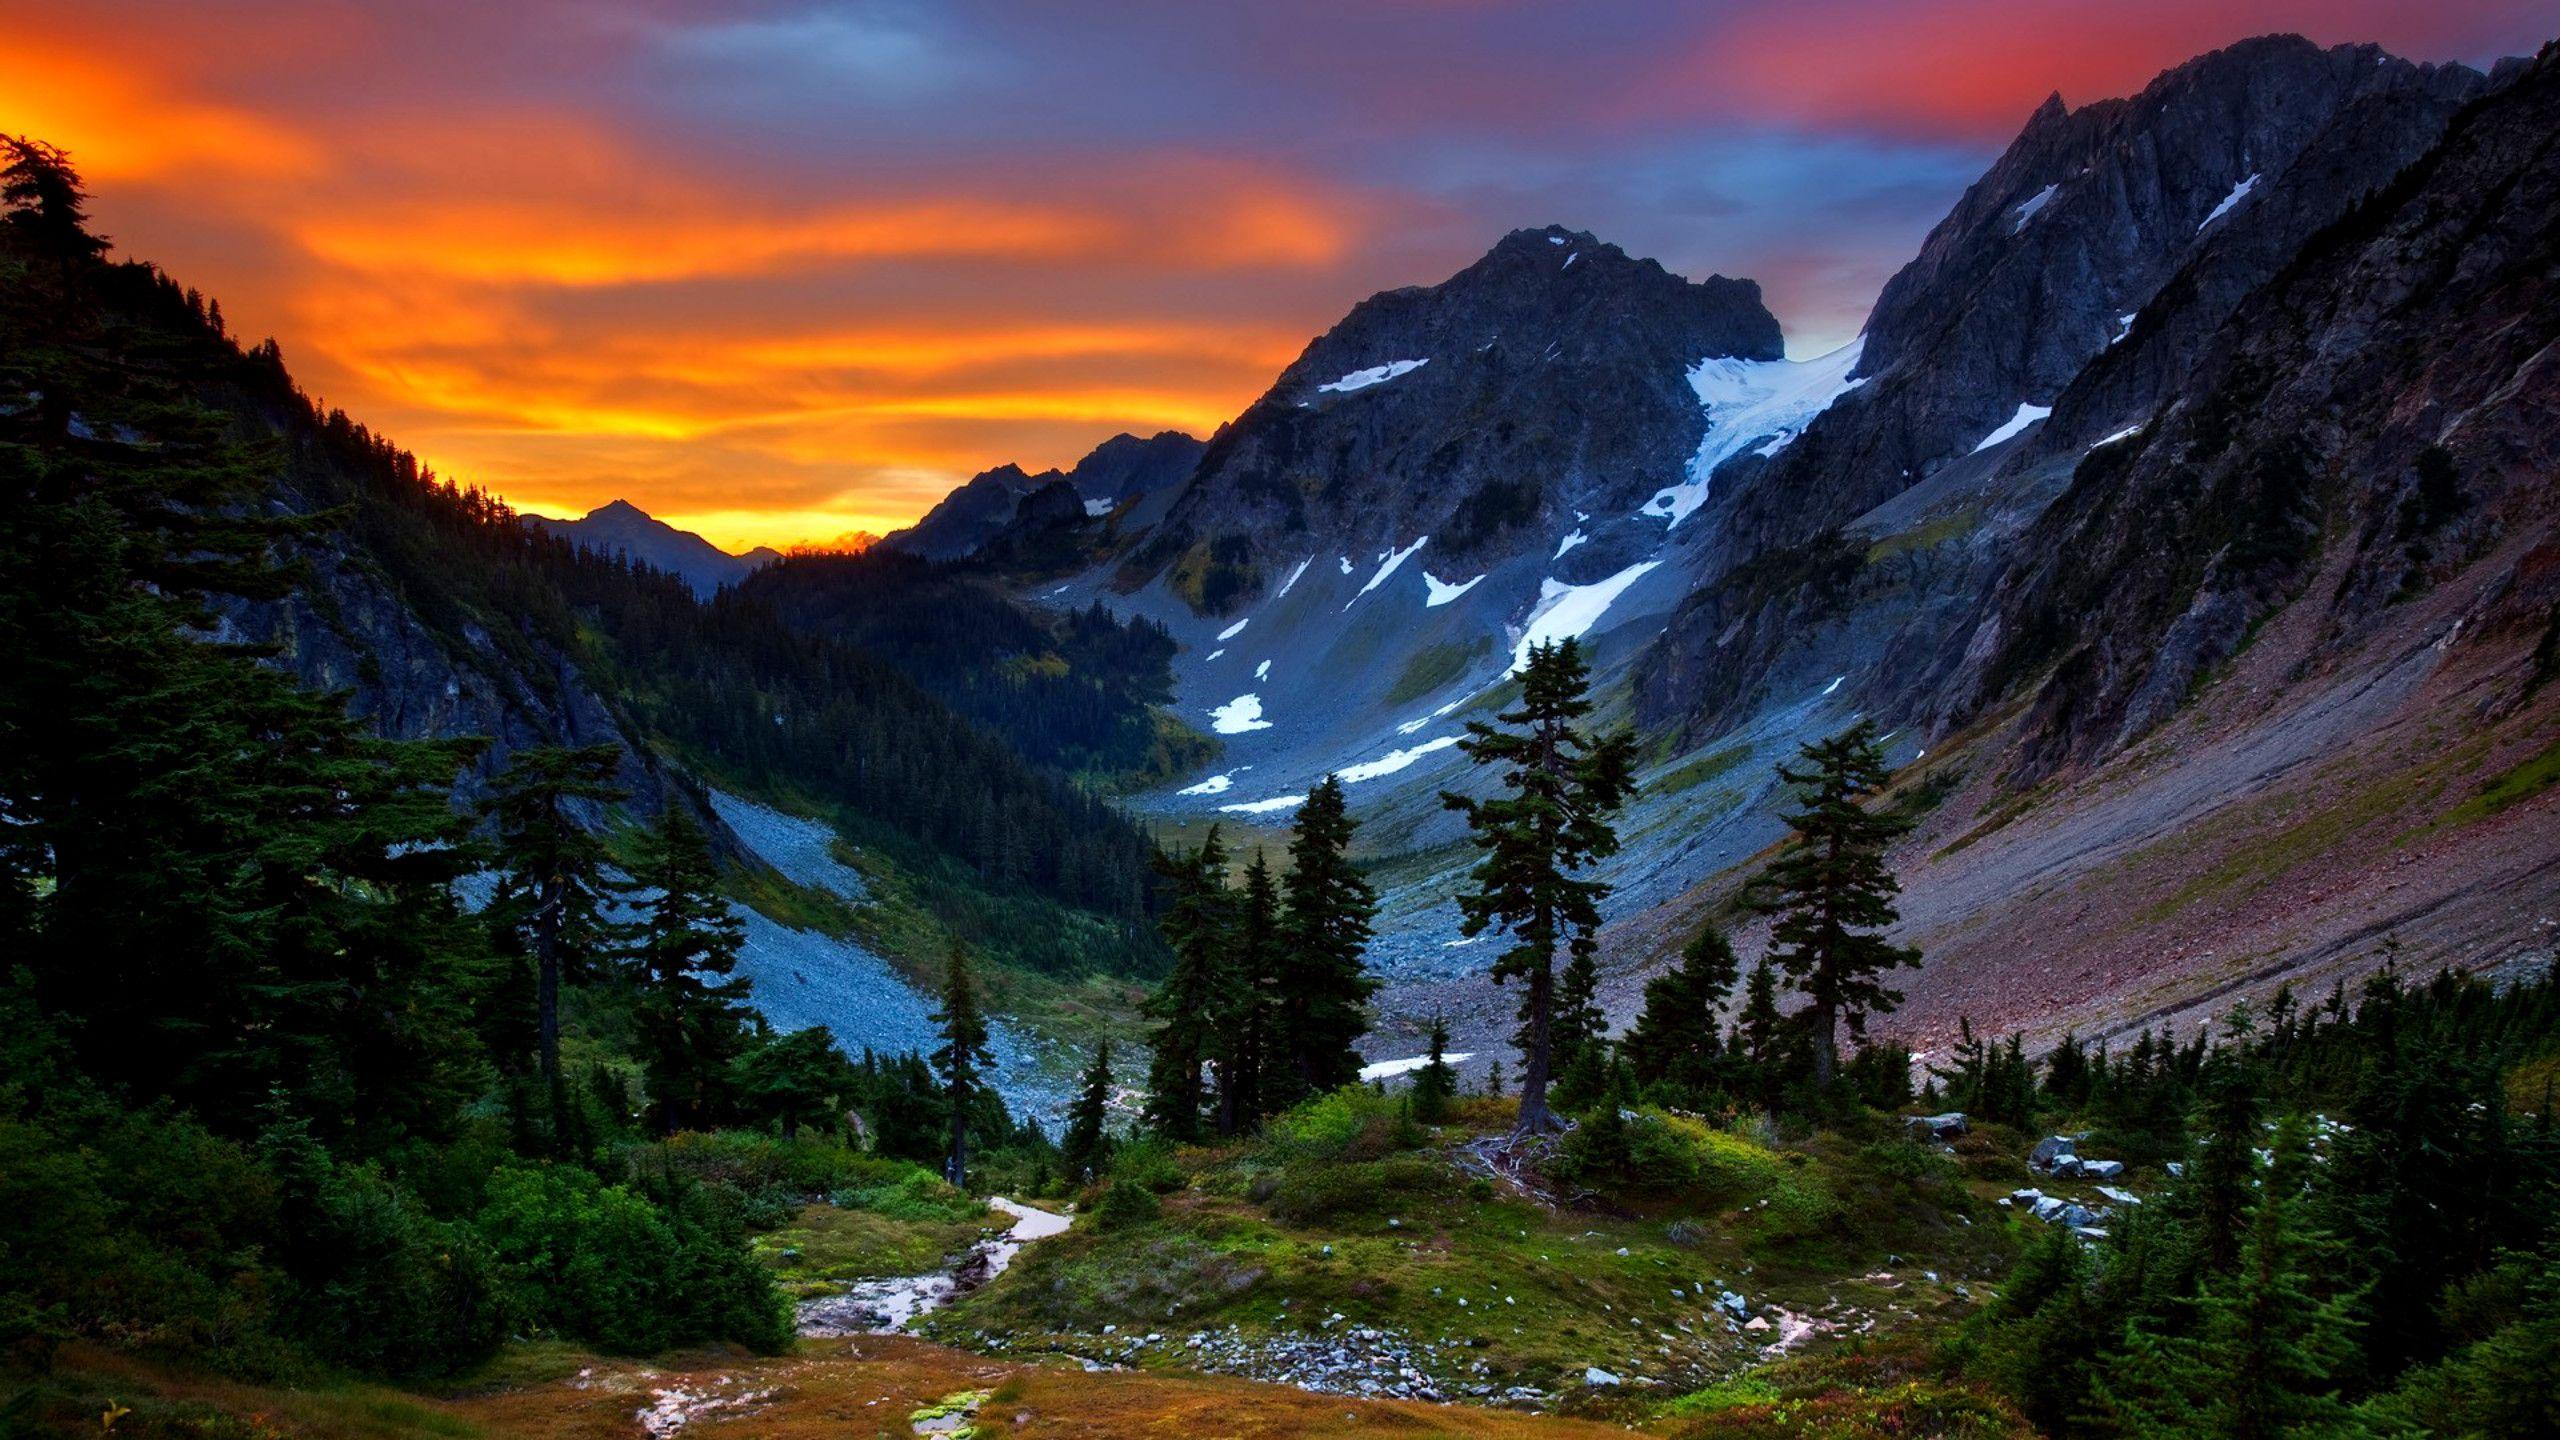 mountain scenes wallpaper